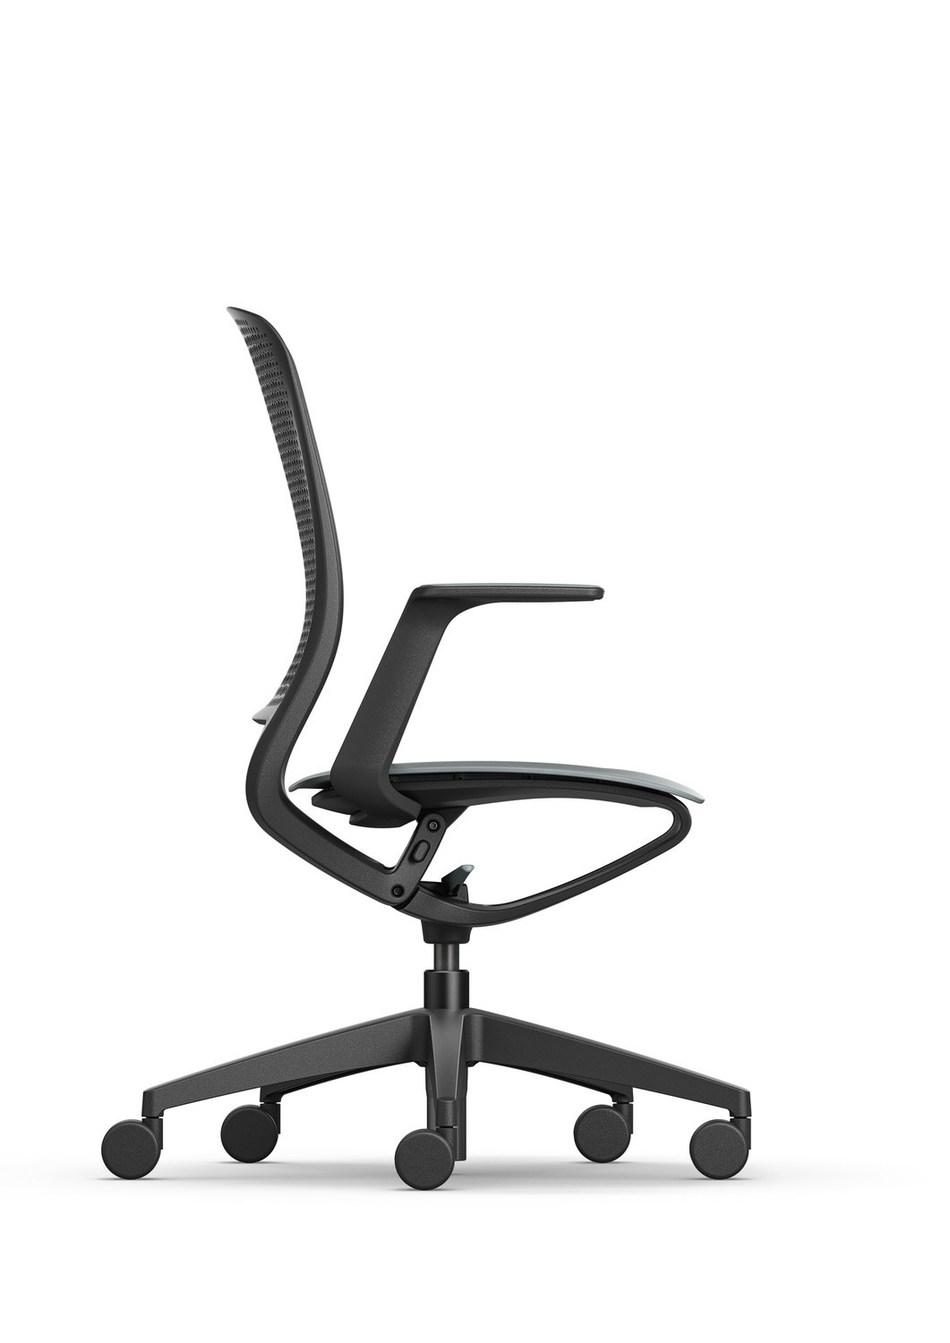 se:motion is the first ergonomic swivel chair without conventional mechanics. Photo: Sedus Stoll AG (PRNewsfoto/Sedus Stoll AG)